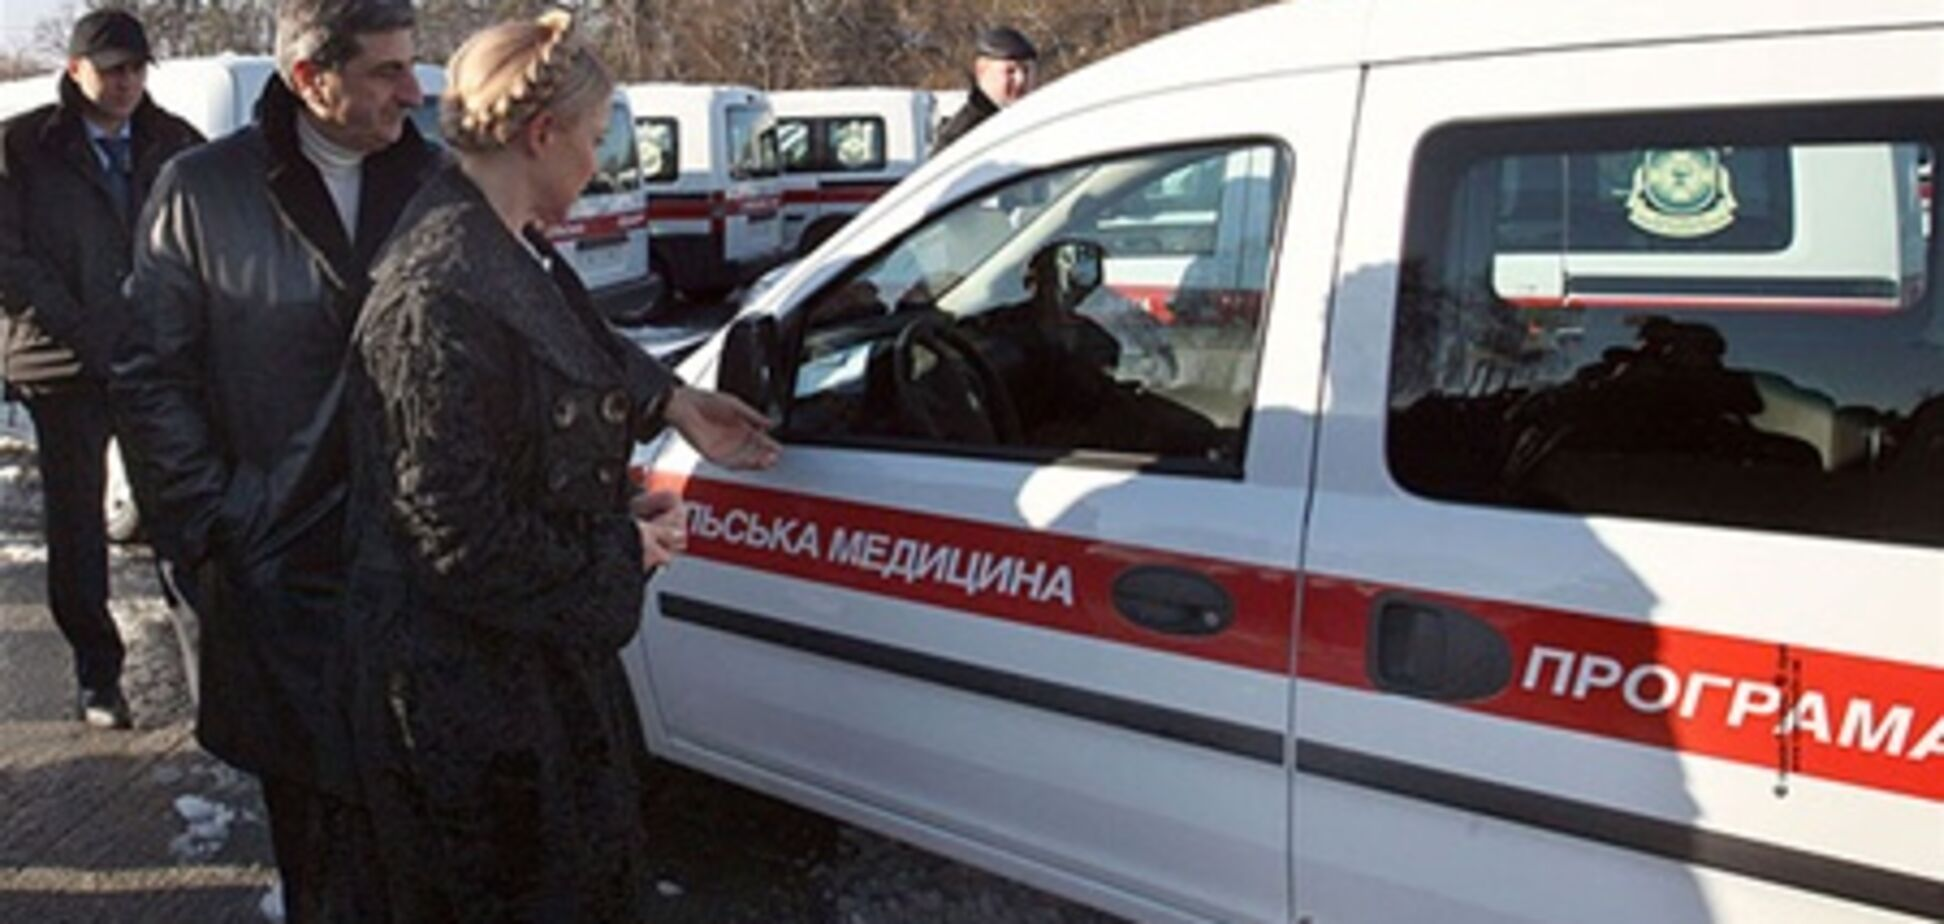 Генпрокуратура шиє нардепа Васадзе до справи Тимошенко